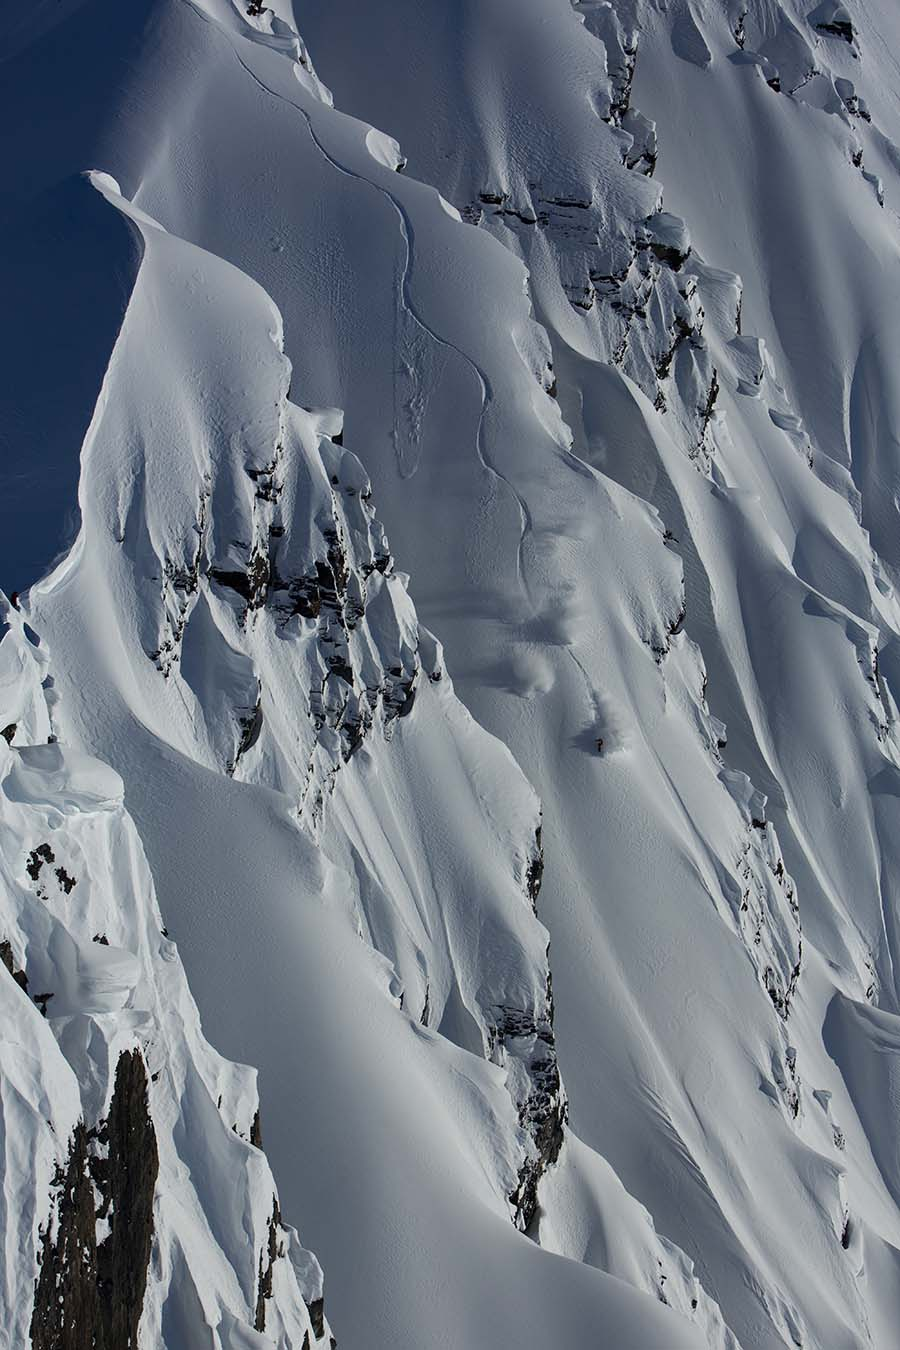 The beauty of Alaskan terrain.